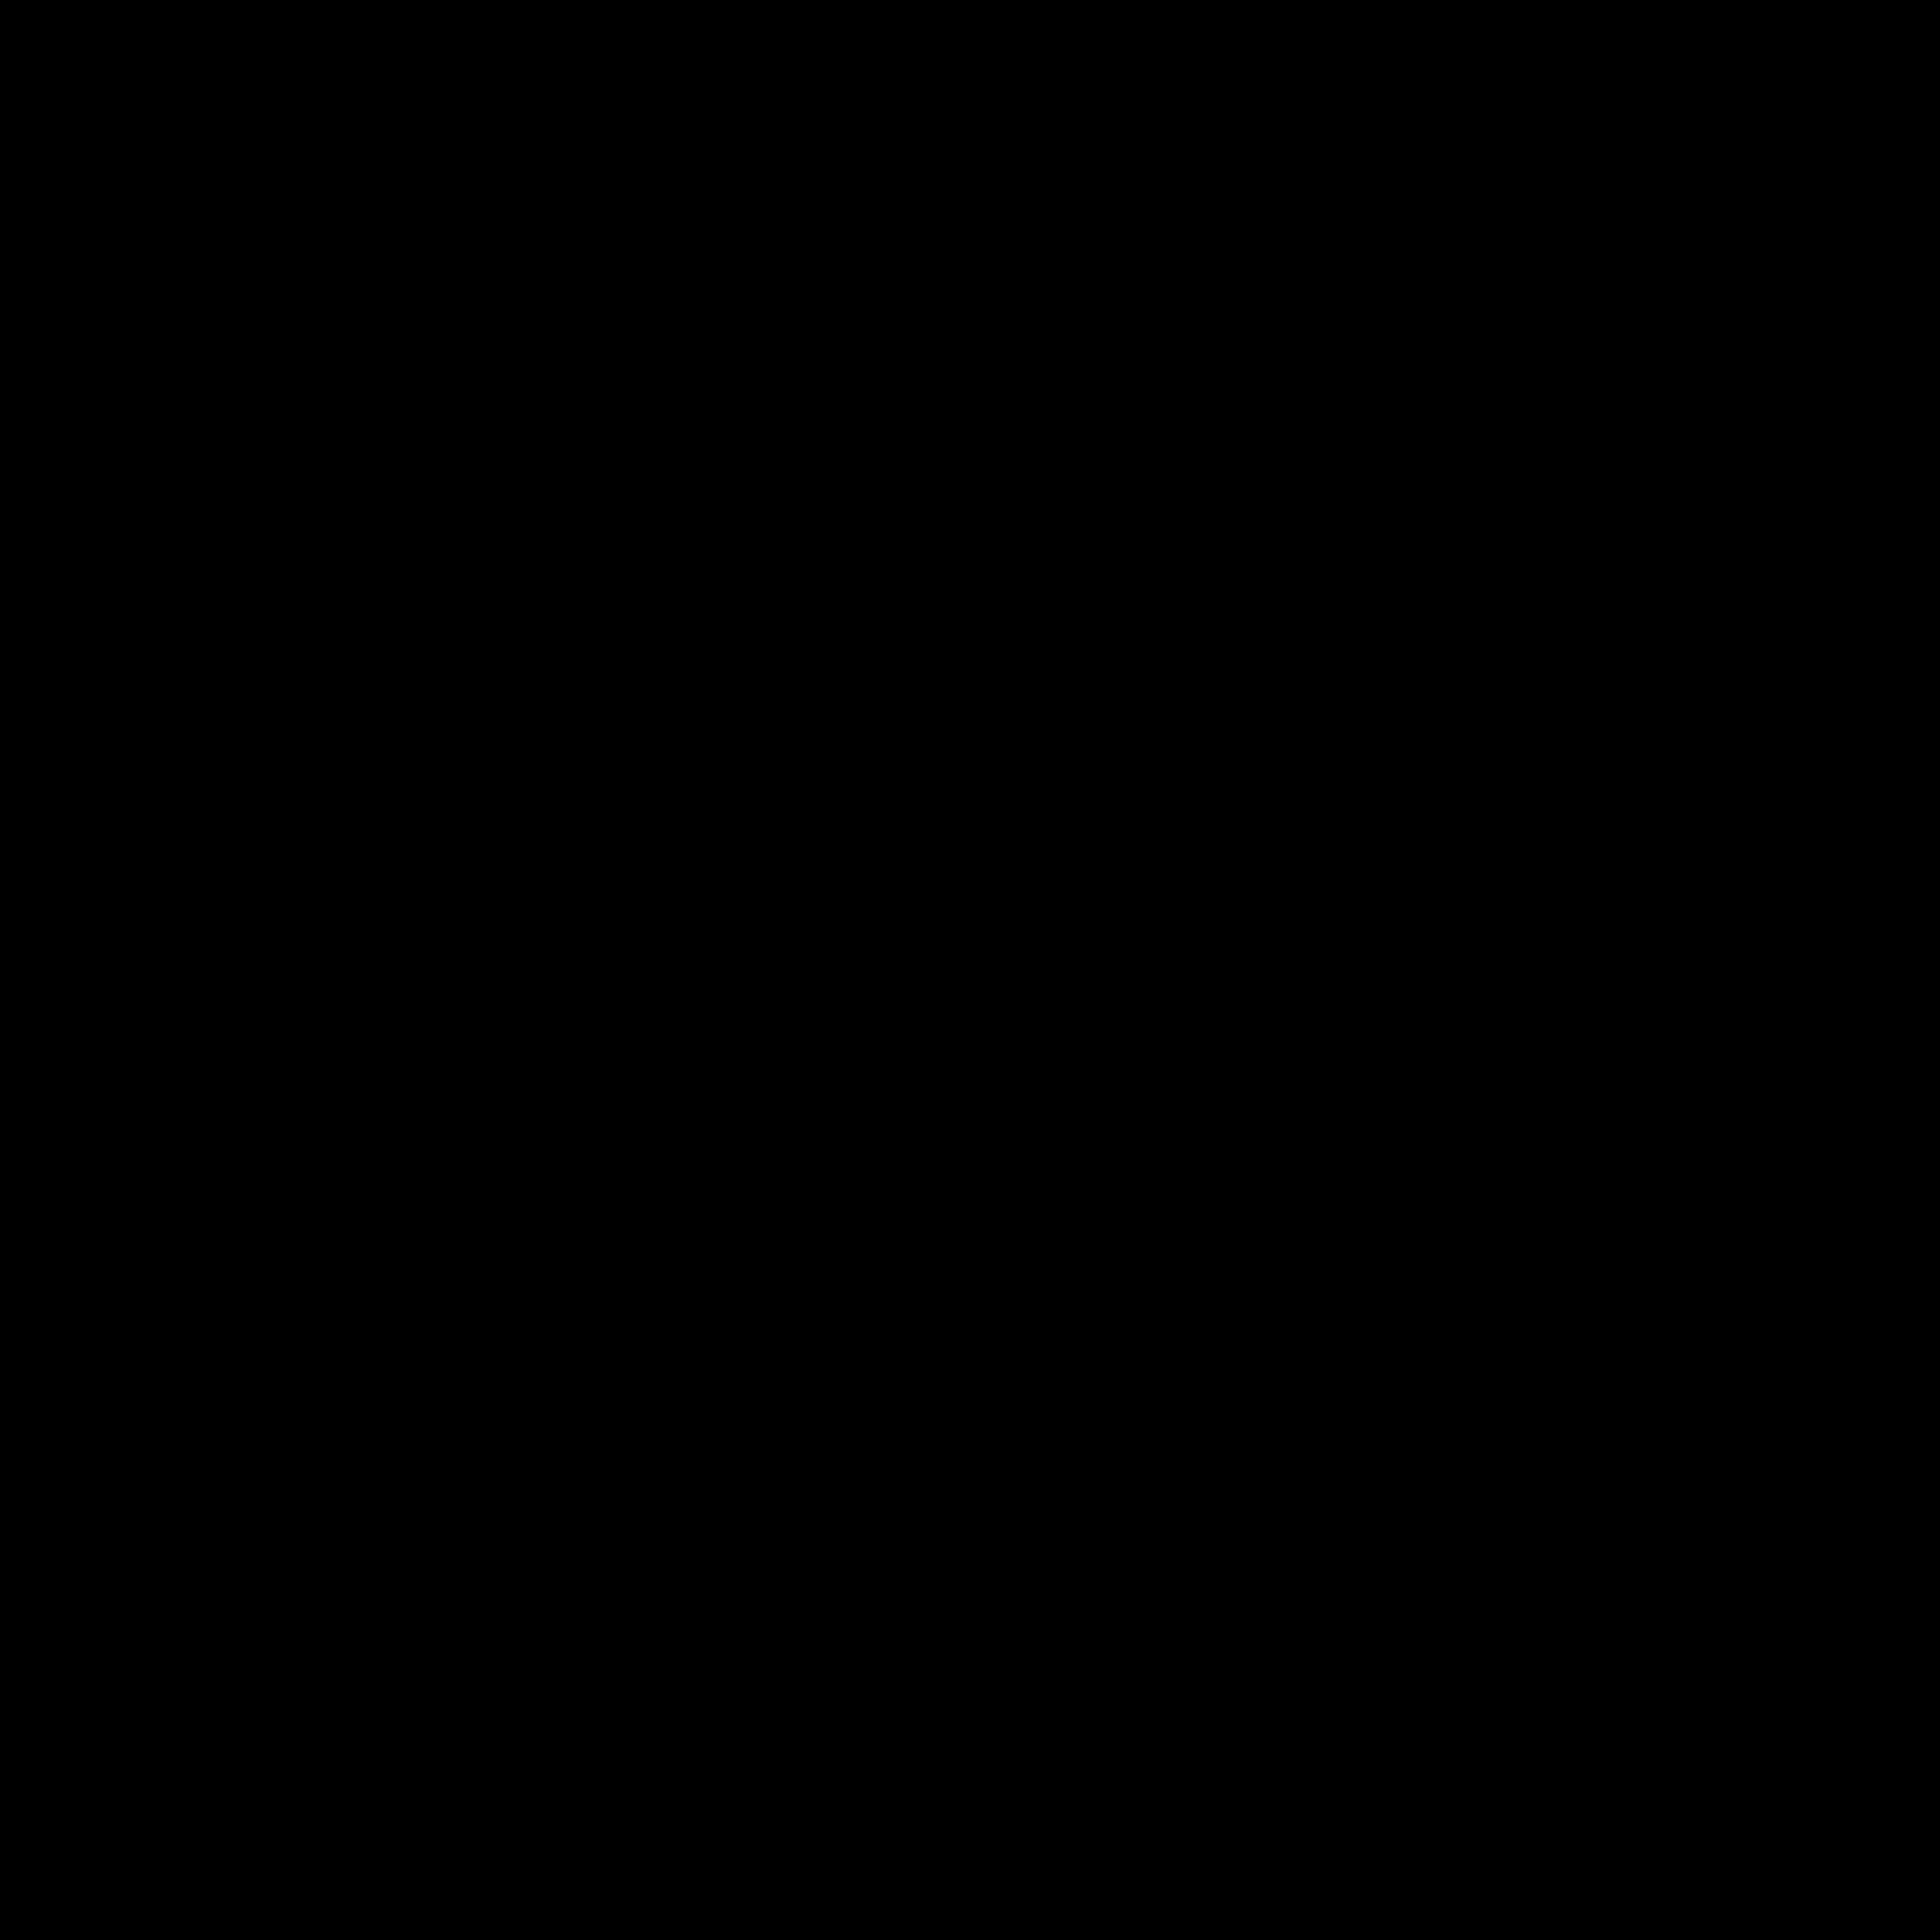 file3-3